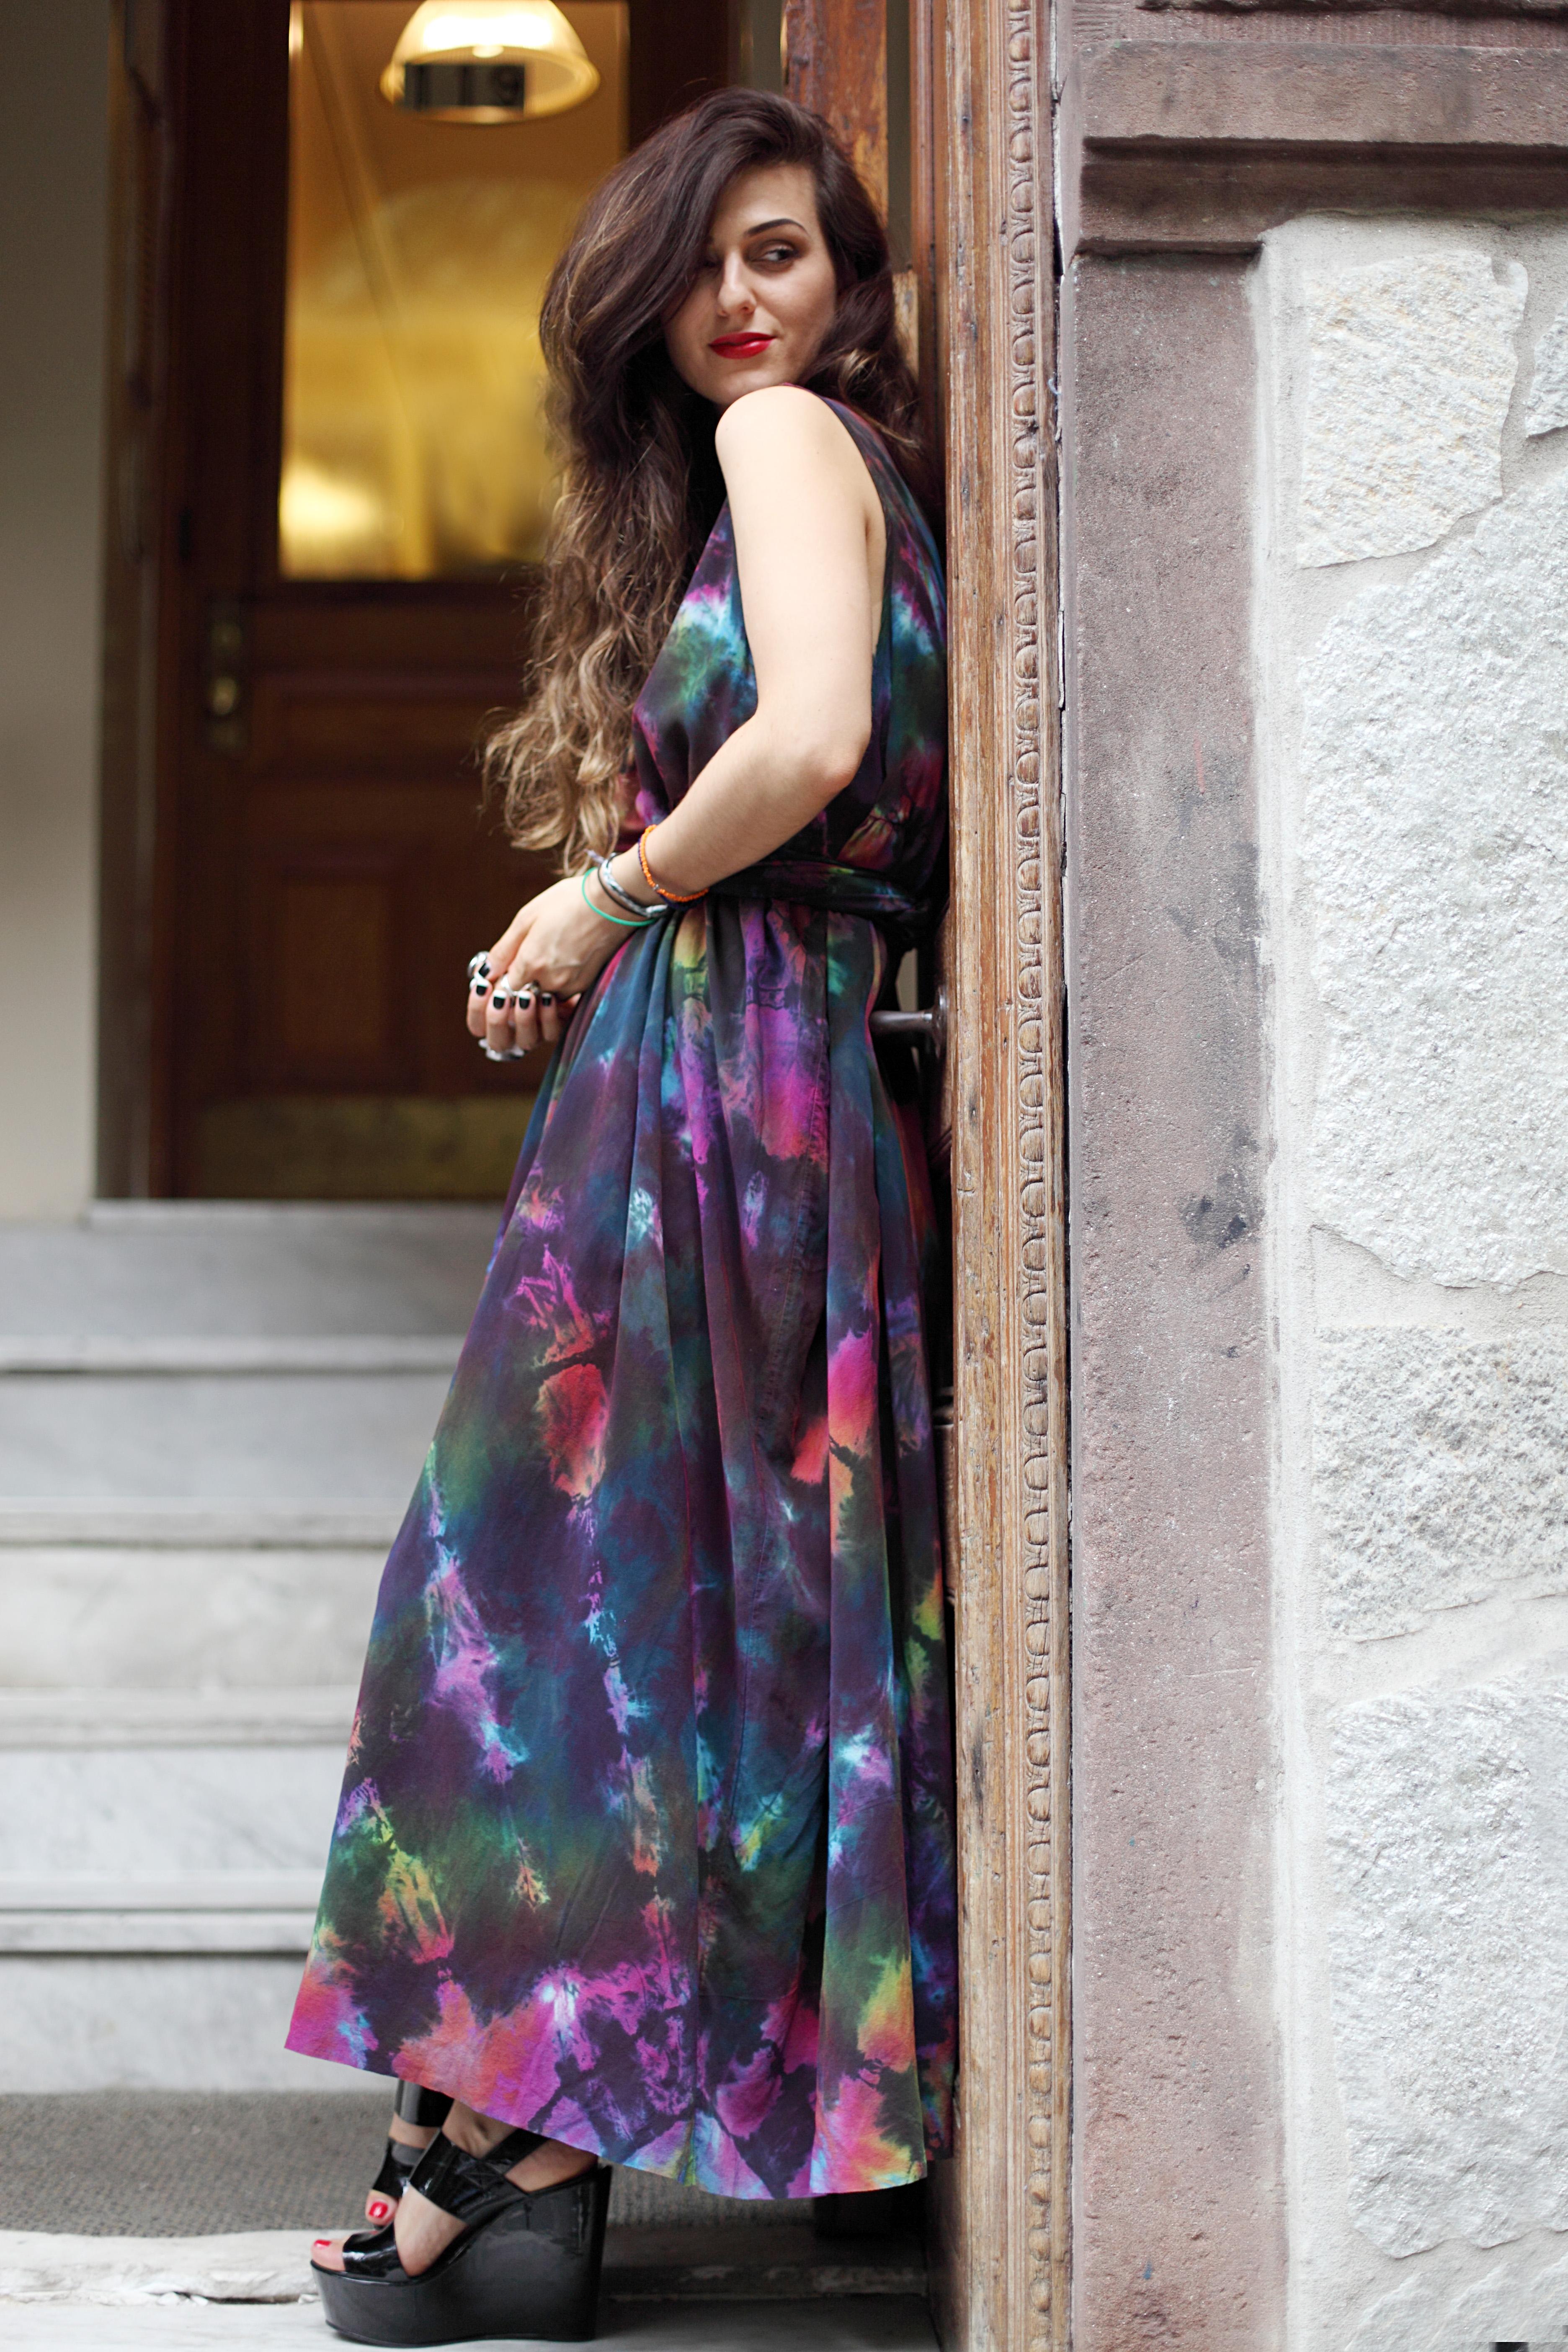 Tie-Dye-Dress-Blogger-Neon